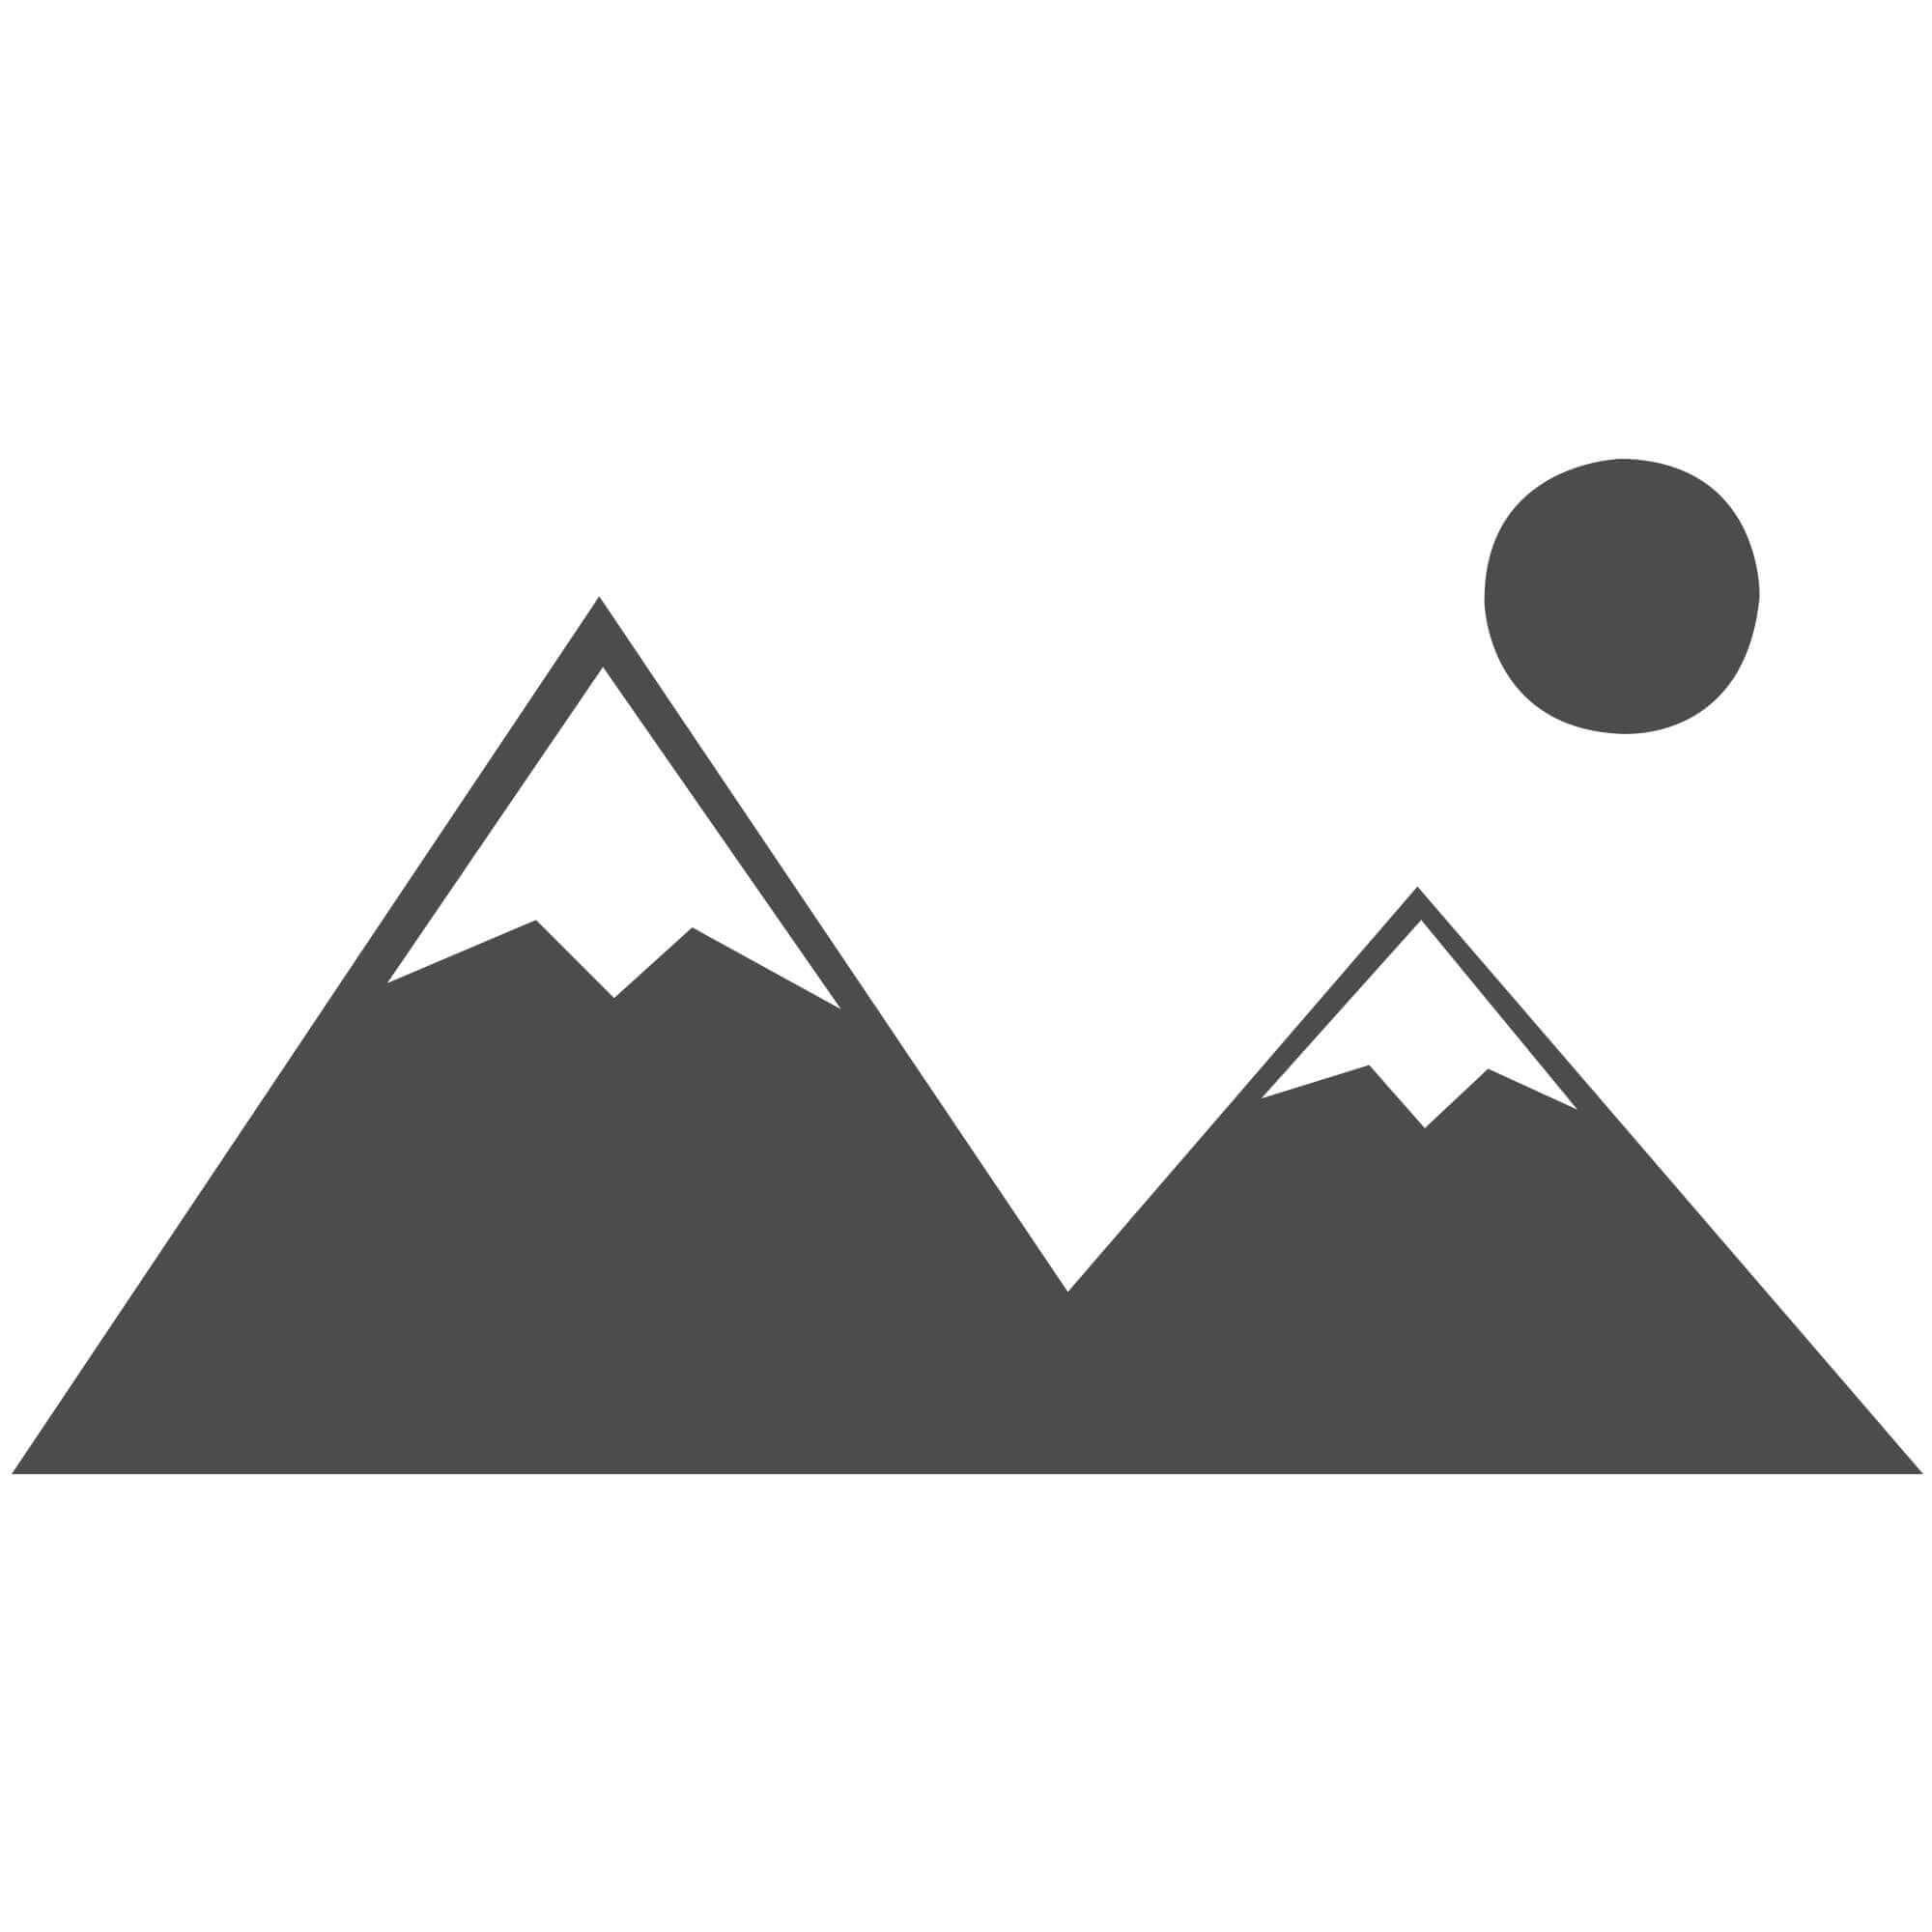 "Velvet Bijoux Rug - Black Grey - Size 120 x 170 cm (4' x 5'7"")"